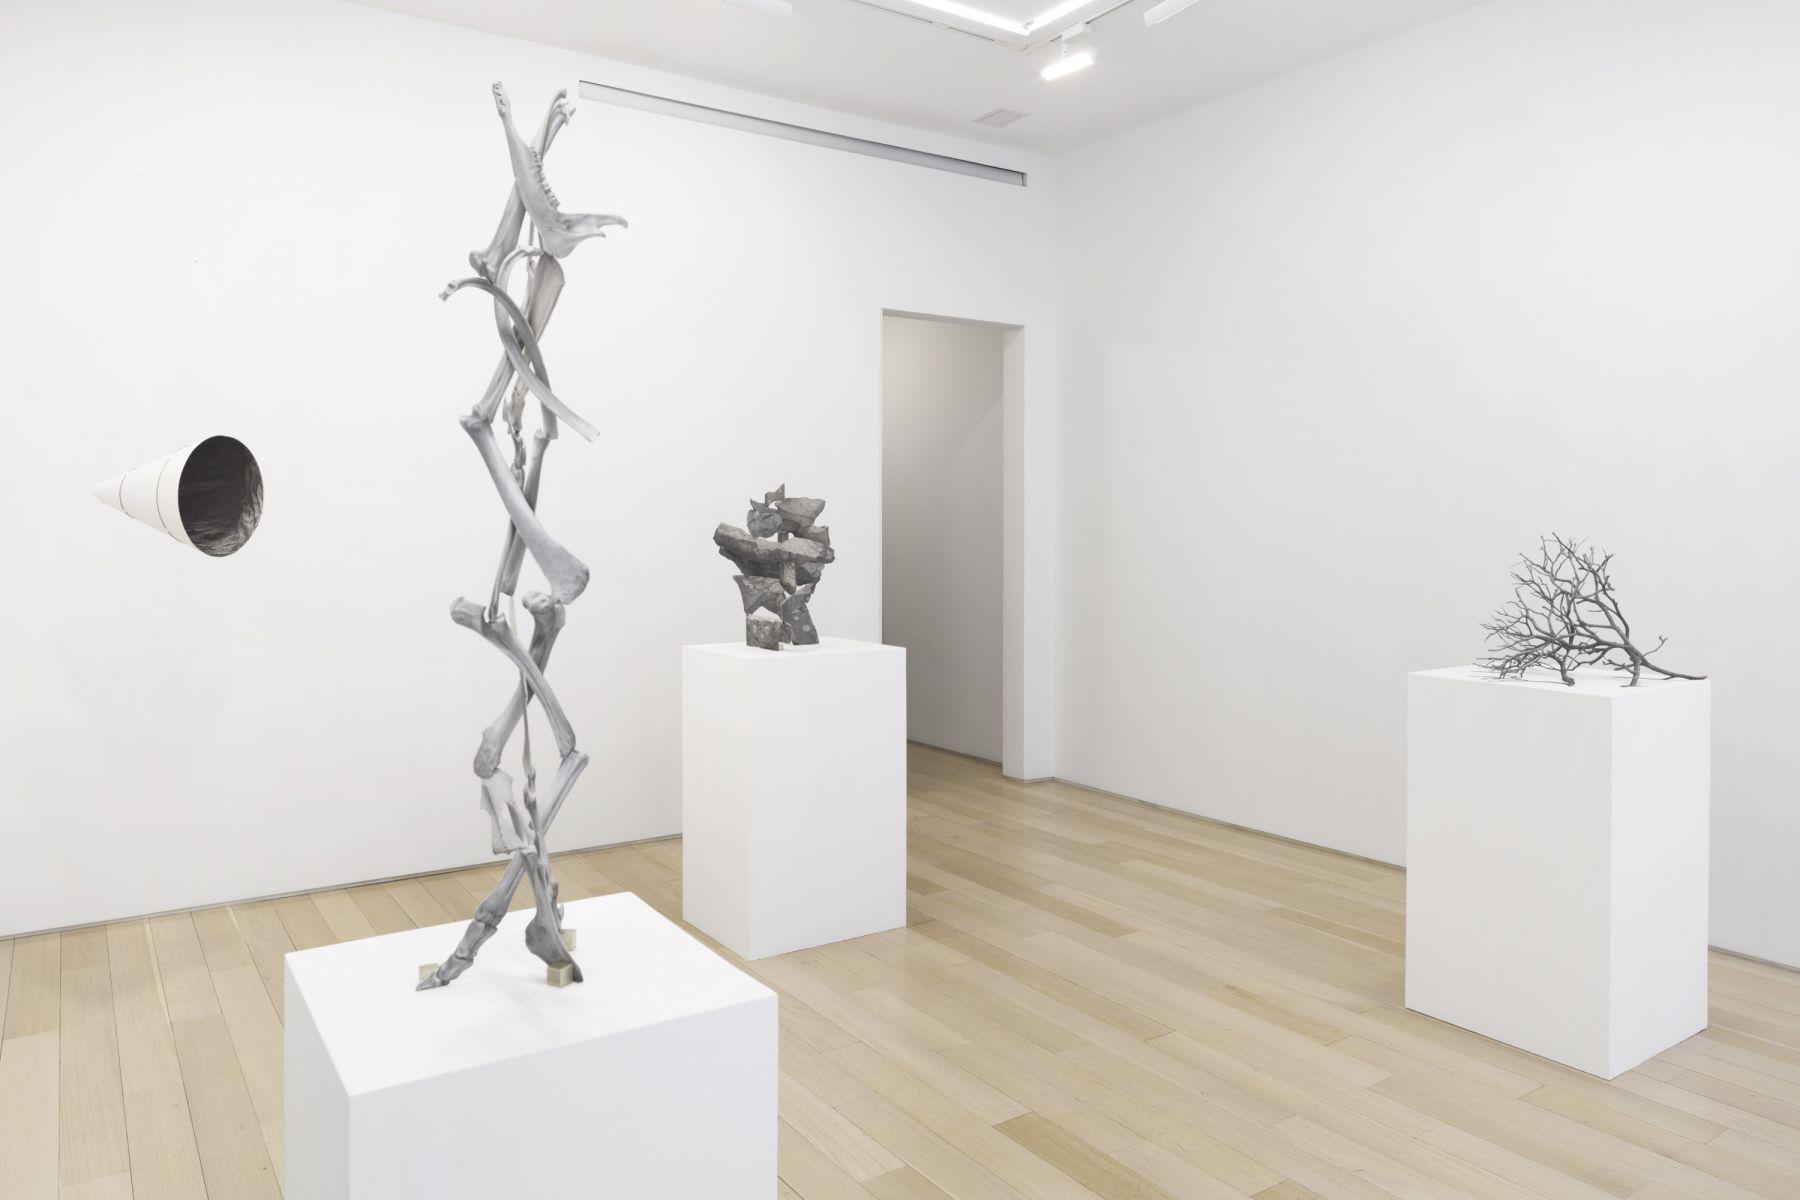 Gallery installation View, 2019